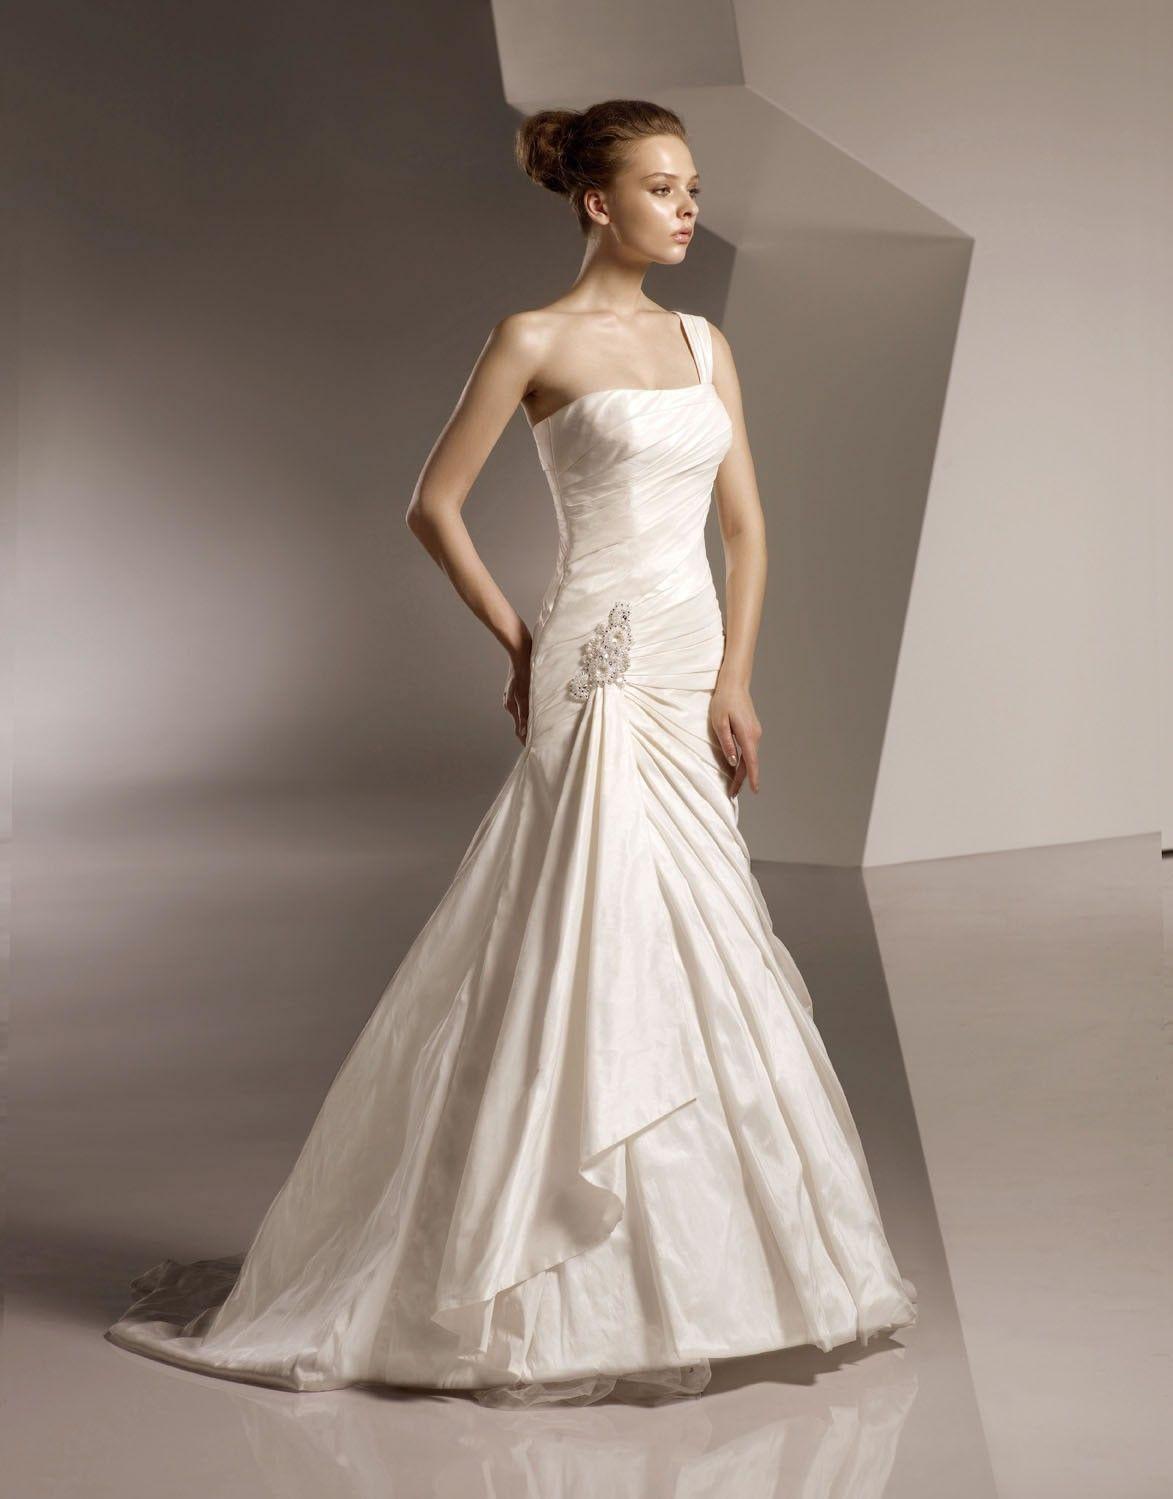 Softly Curved Neckline Directionally Ruched Bodice Mermaid Wedding Dress